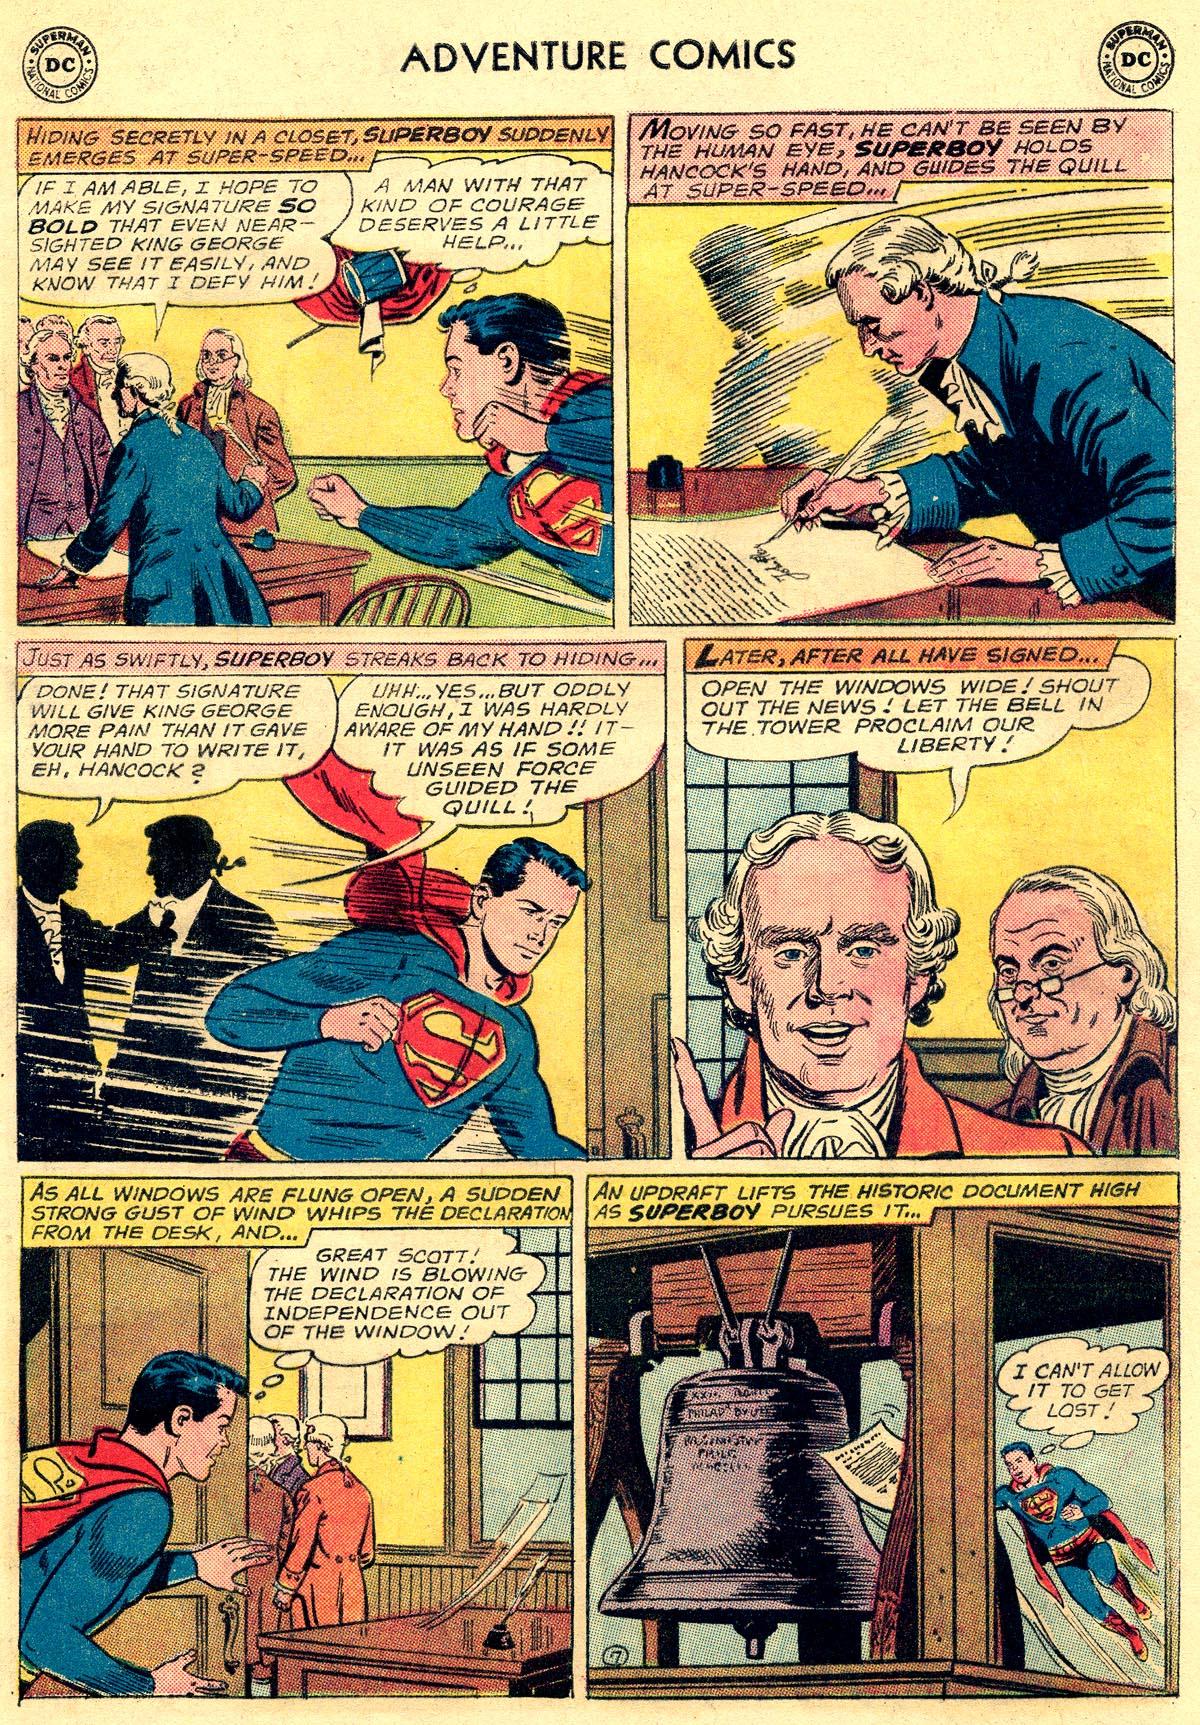 Read online Adventure Comics (1938) comic -  Issue #296 - 9